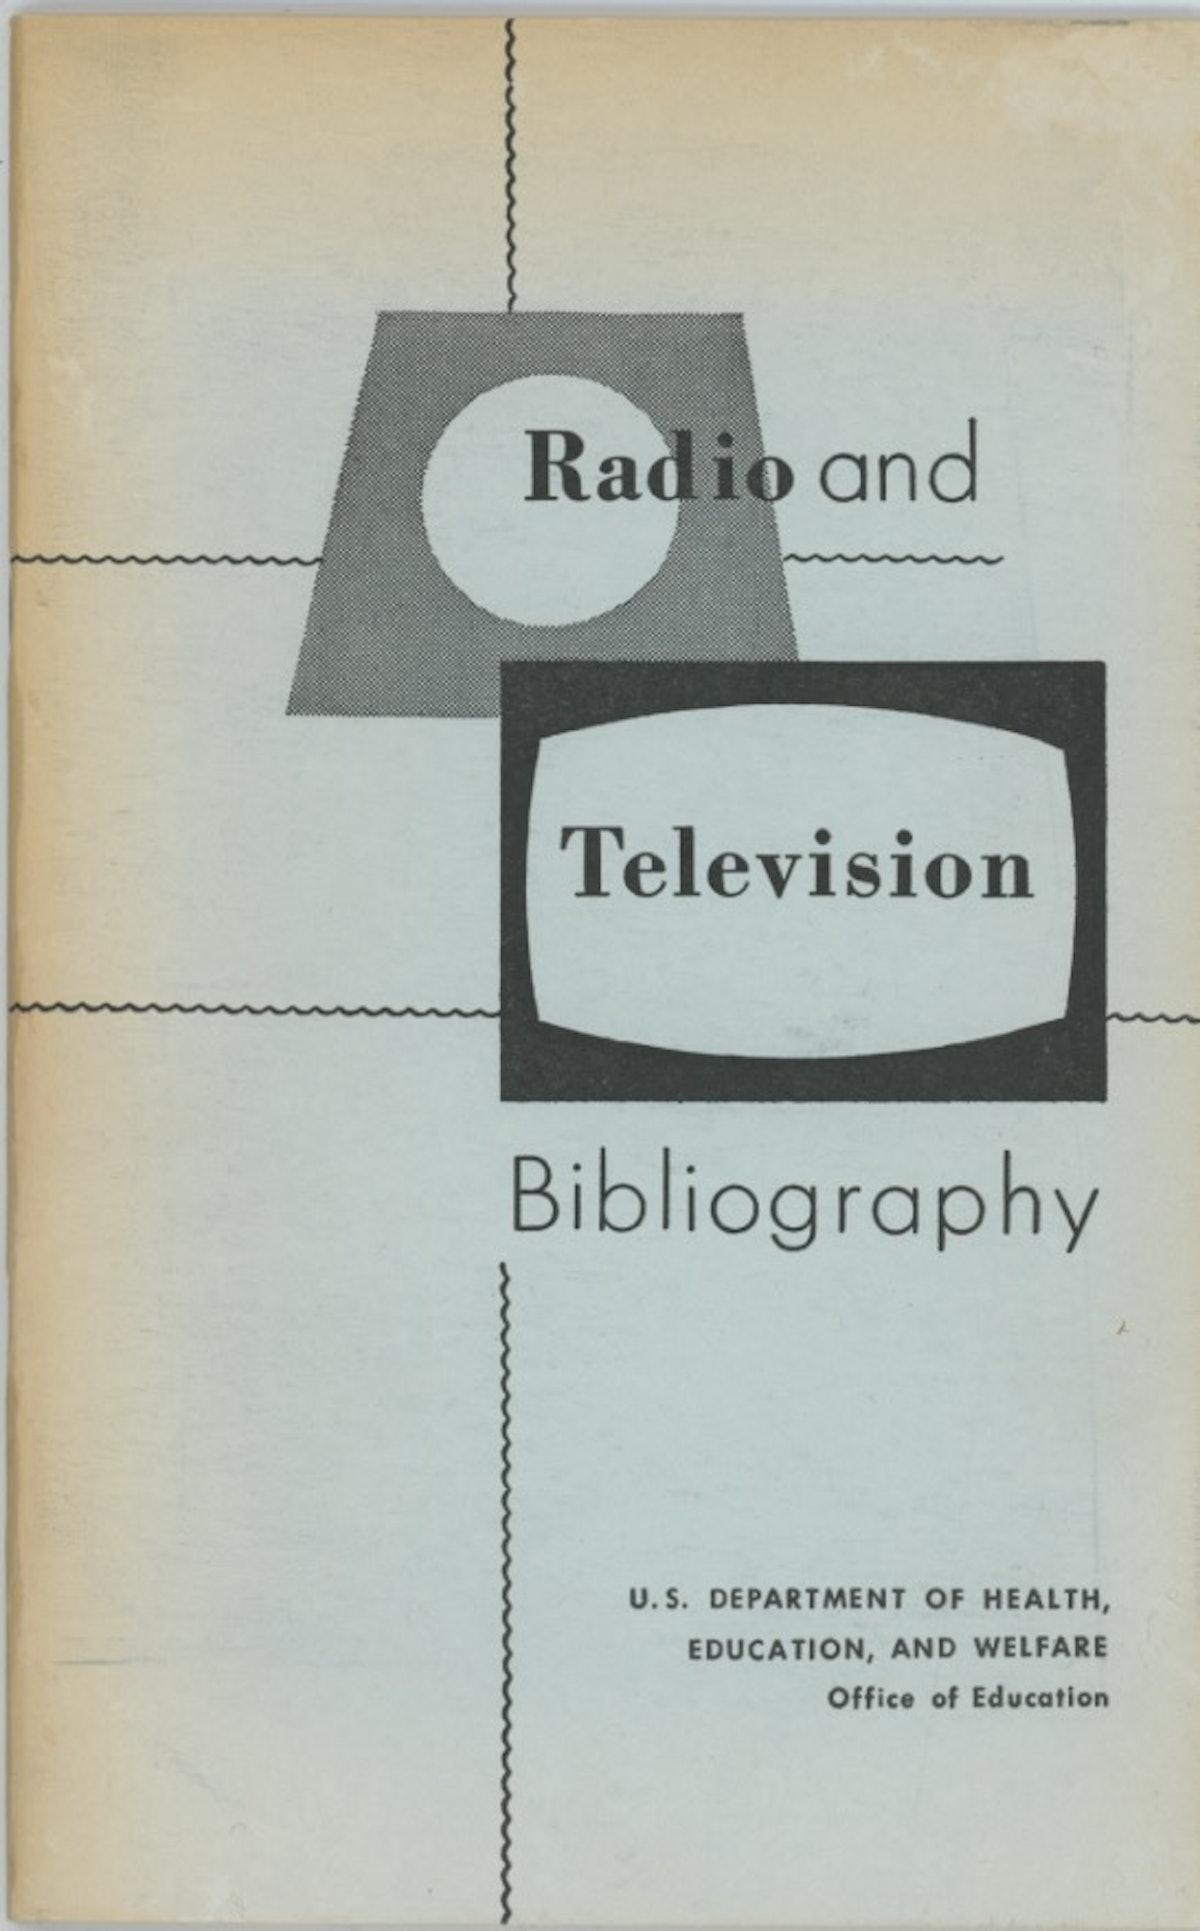 Radio and Television Bibliography